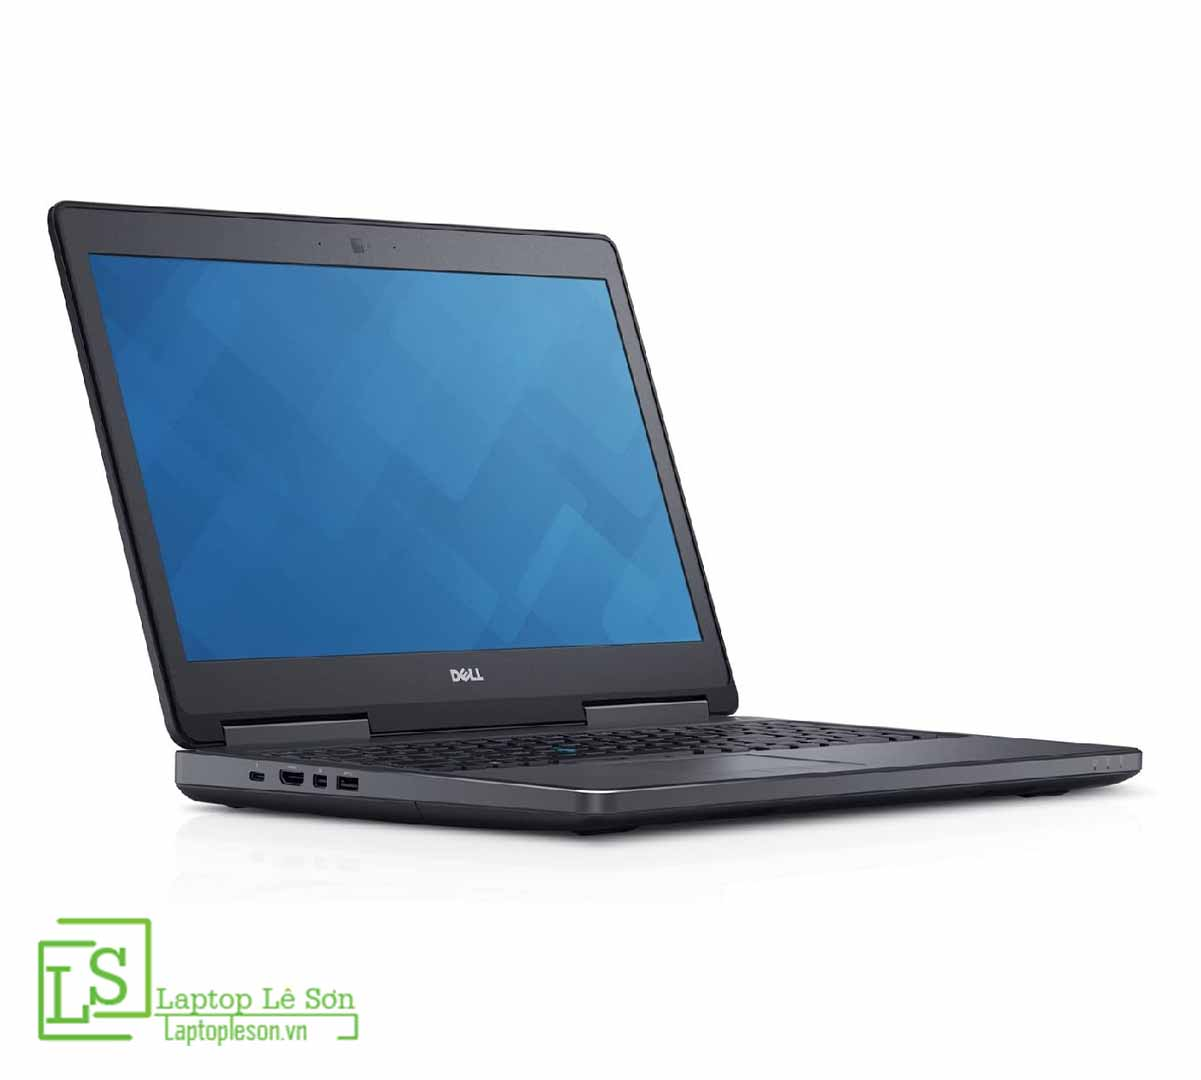 DELL Precision 7520 Laptop Lê Sơn 02